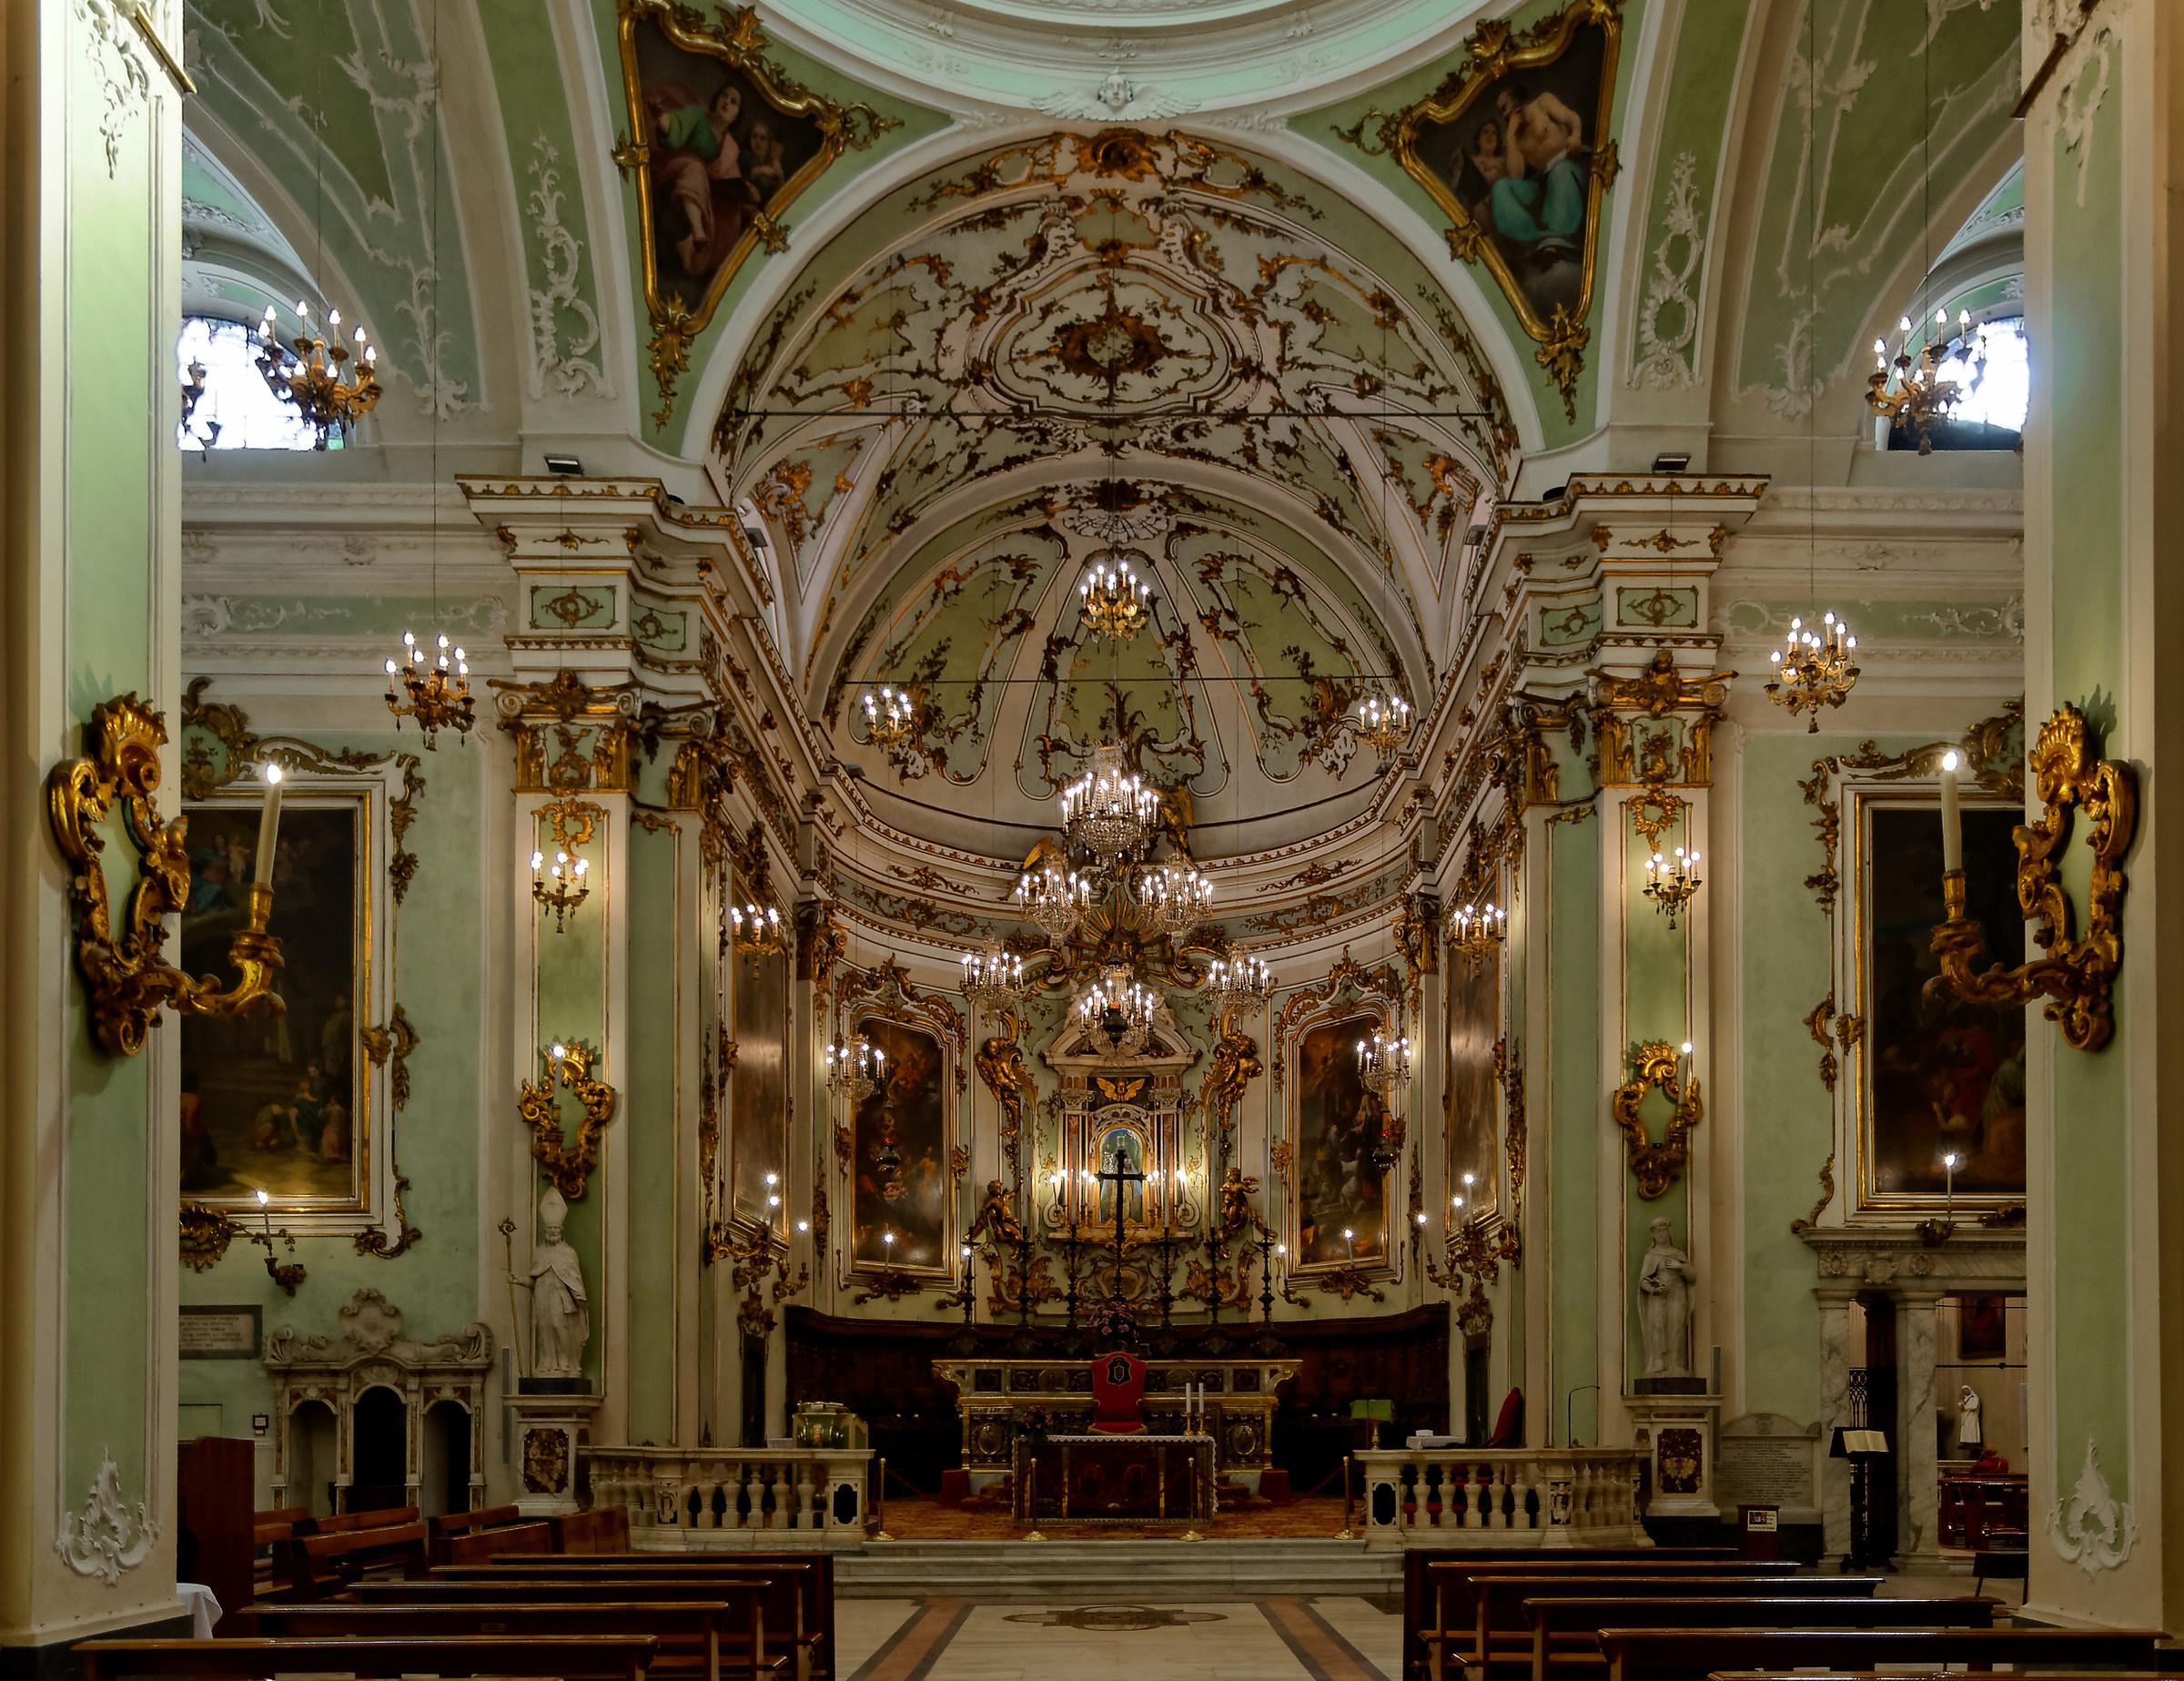 Pontremoli-Duomo di Santa Maria Assunta...